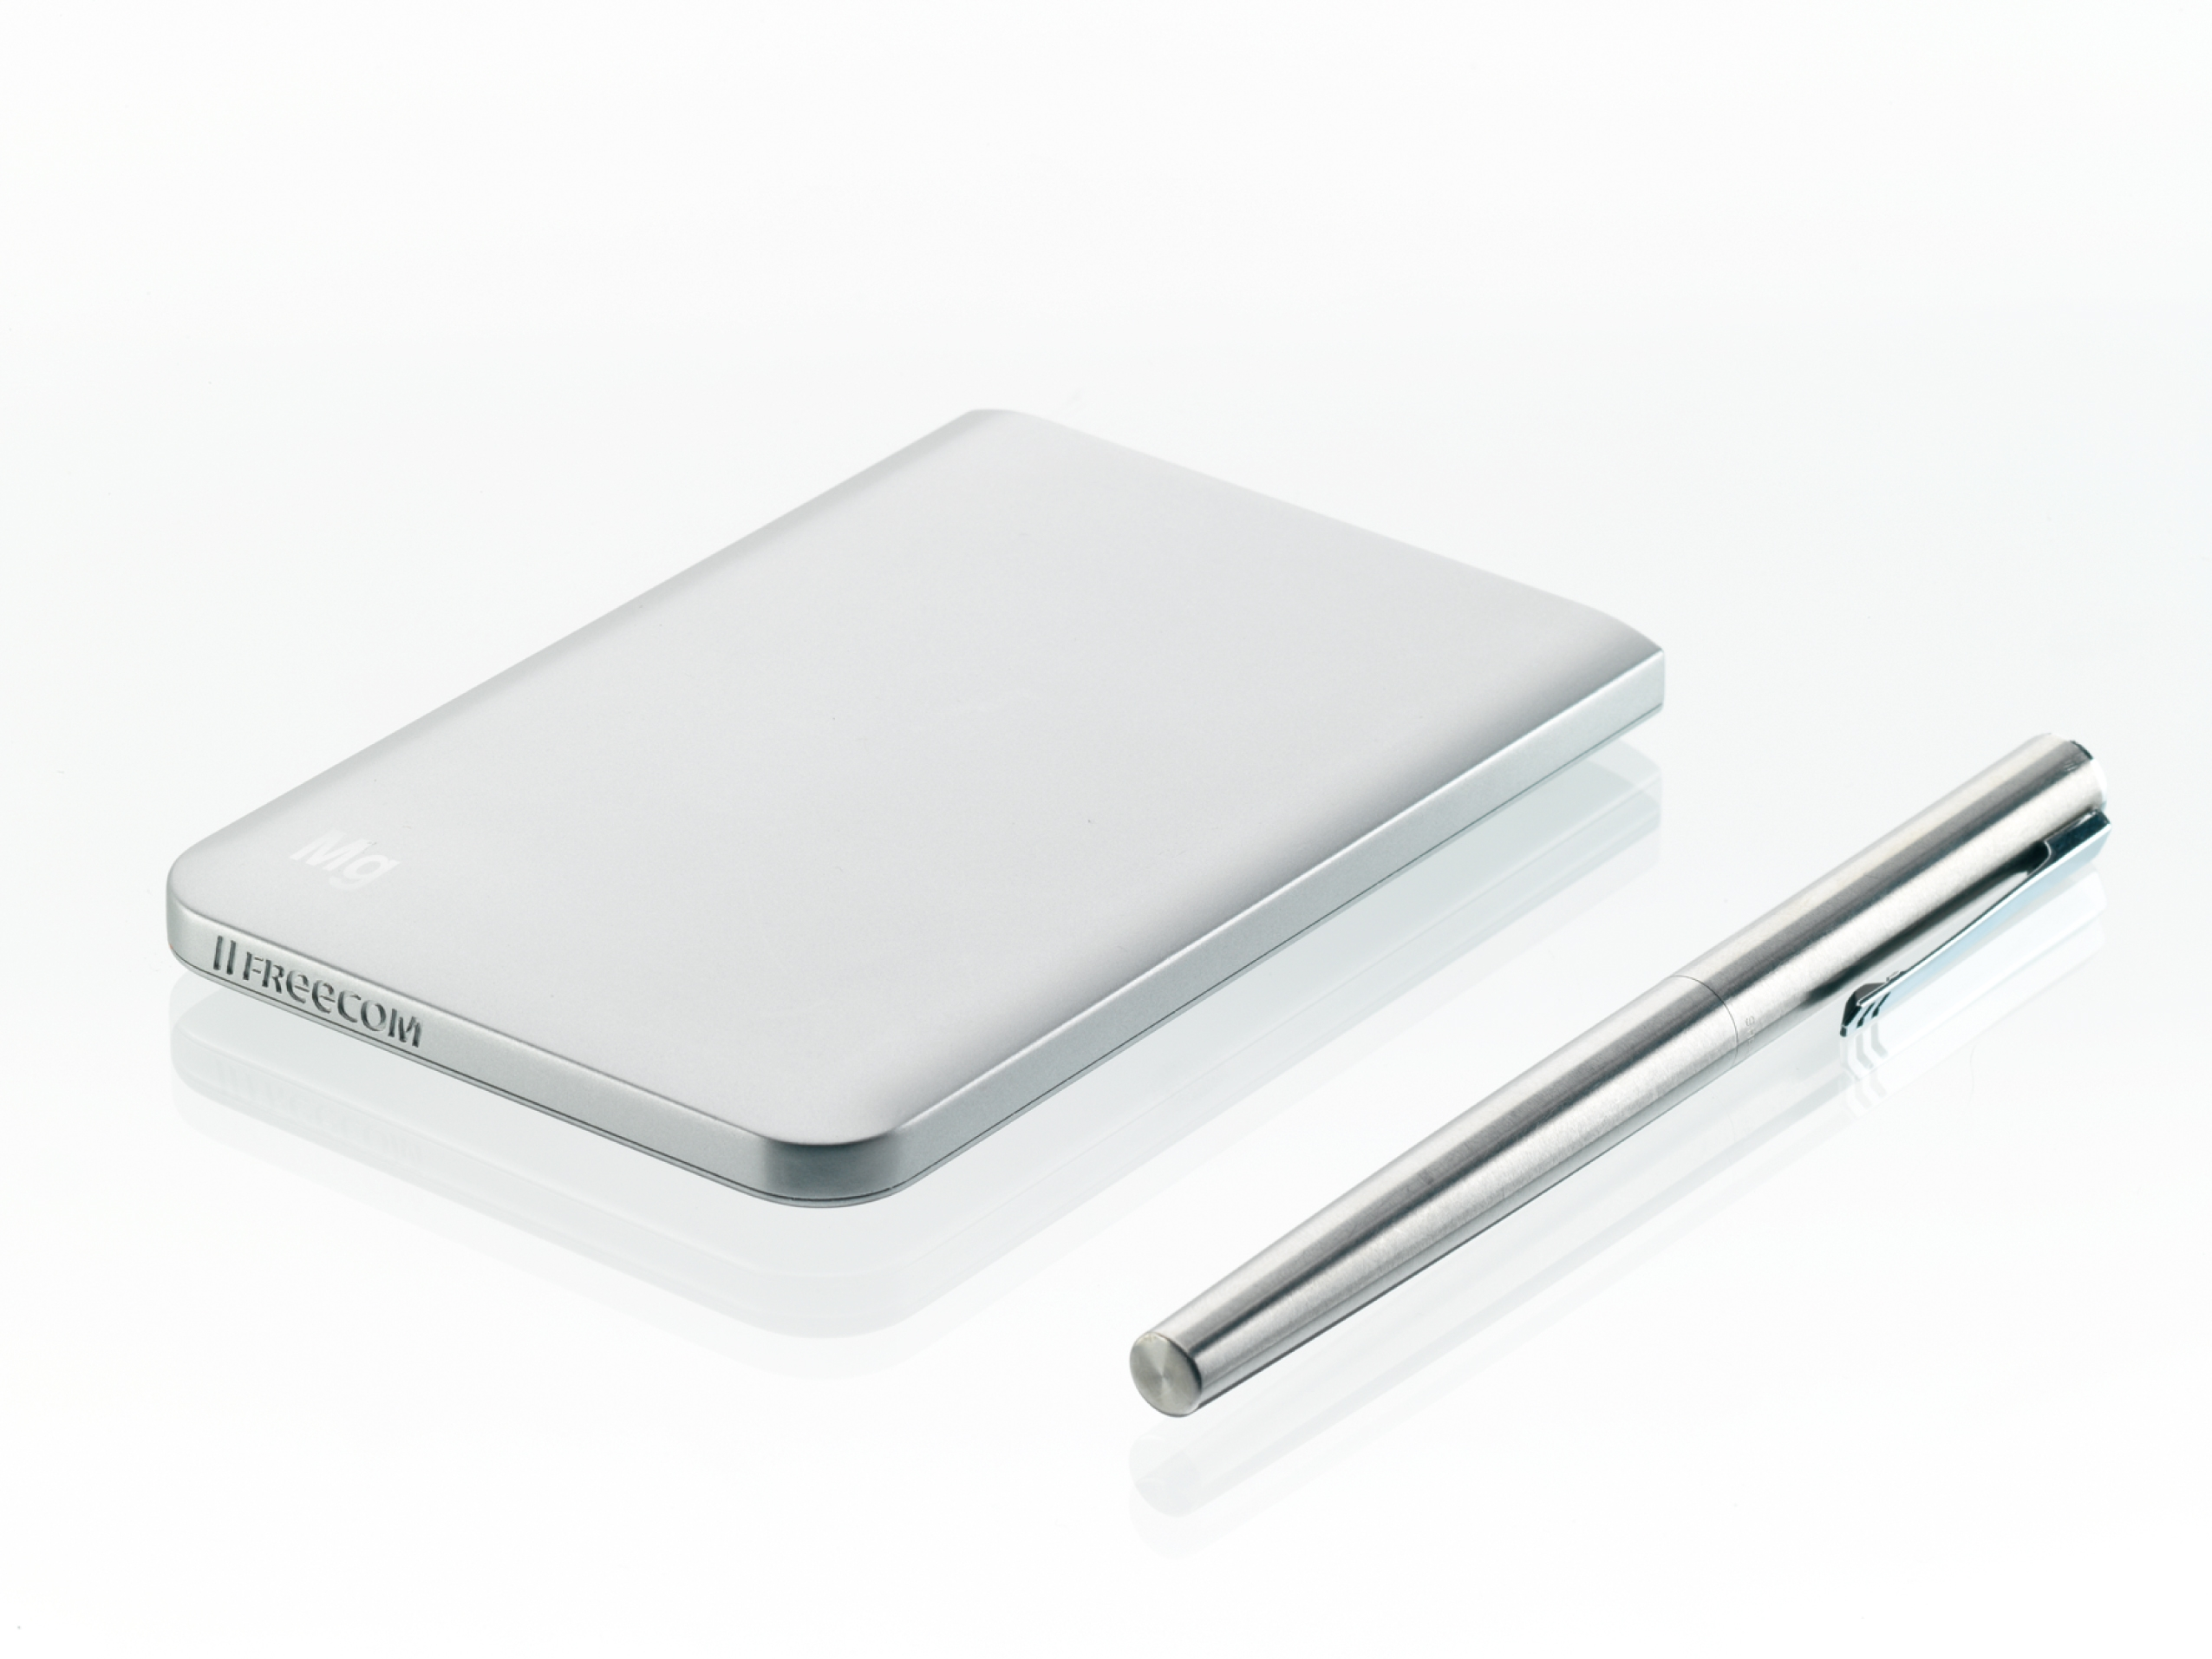 Freecom: Externe Festplatte mit 1 cm Höhe - Freecom Mobile Drive Mg